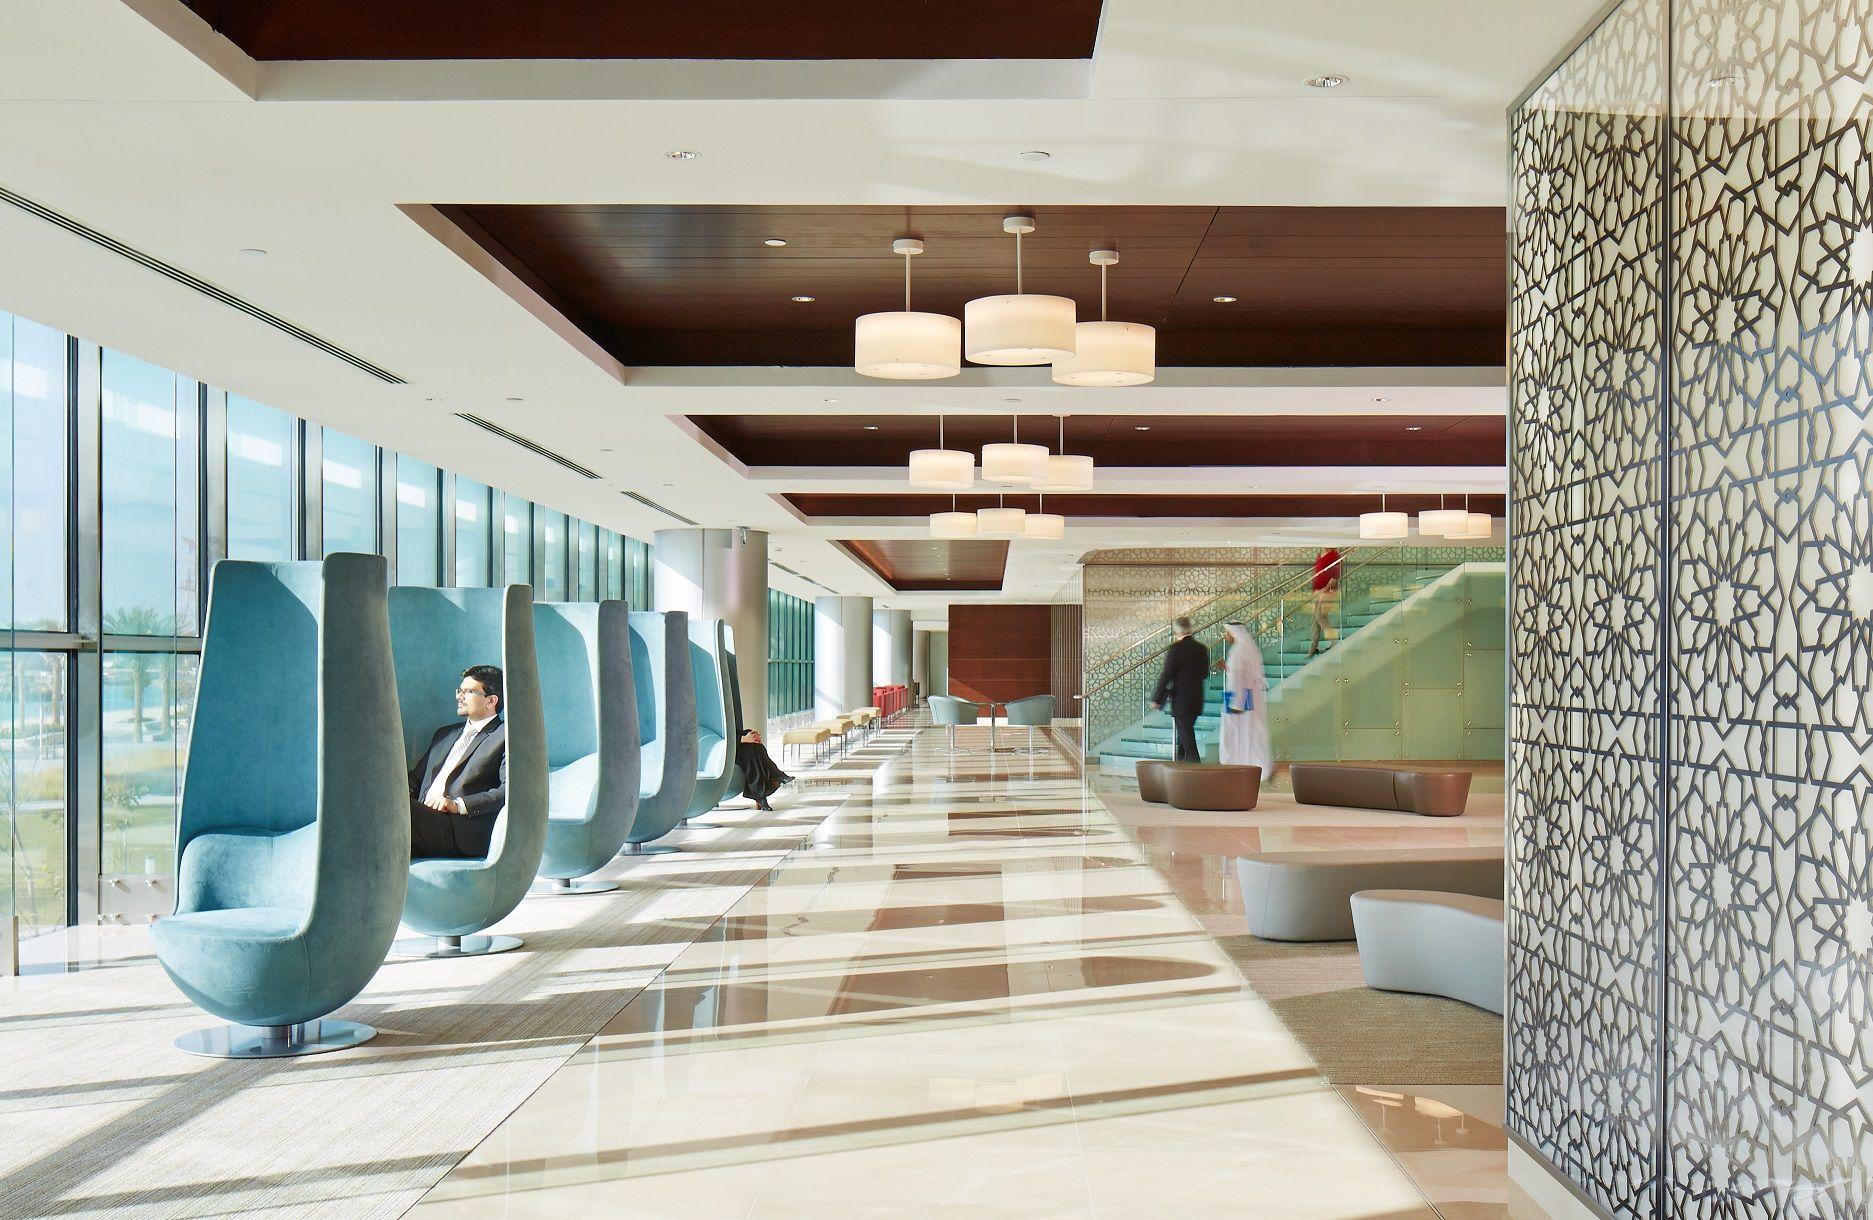 Cleveland Clinic Abu Dhabi Hospital HDR Inc